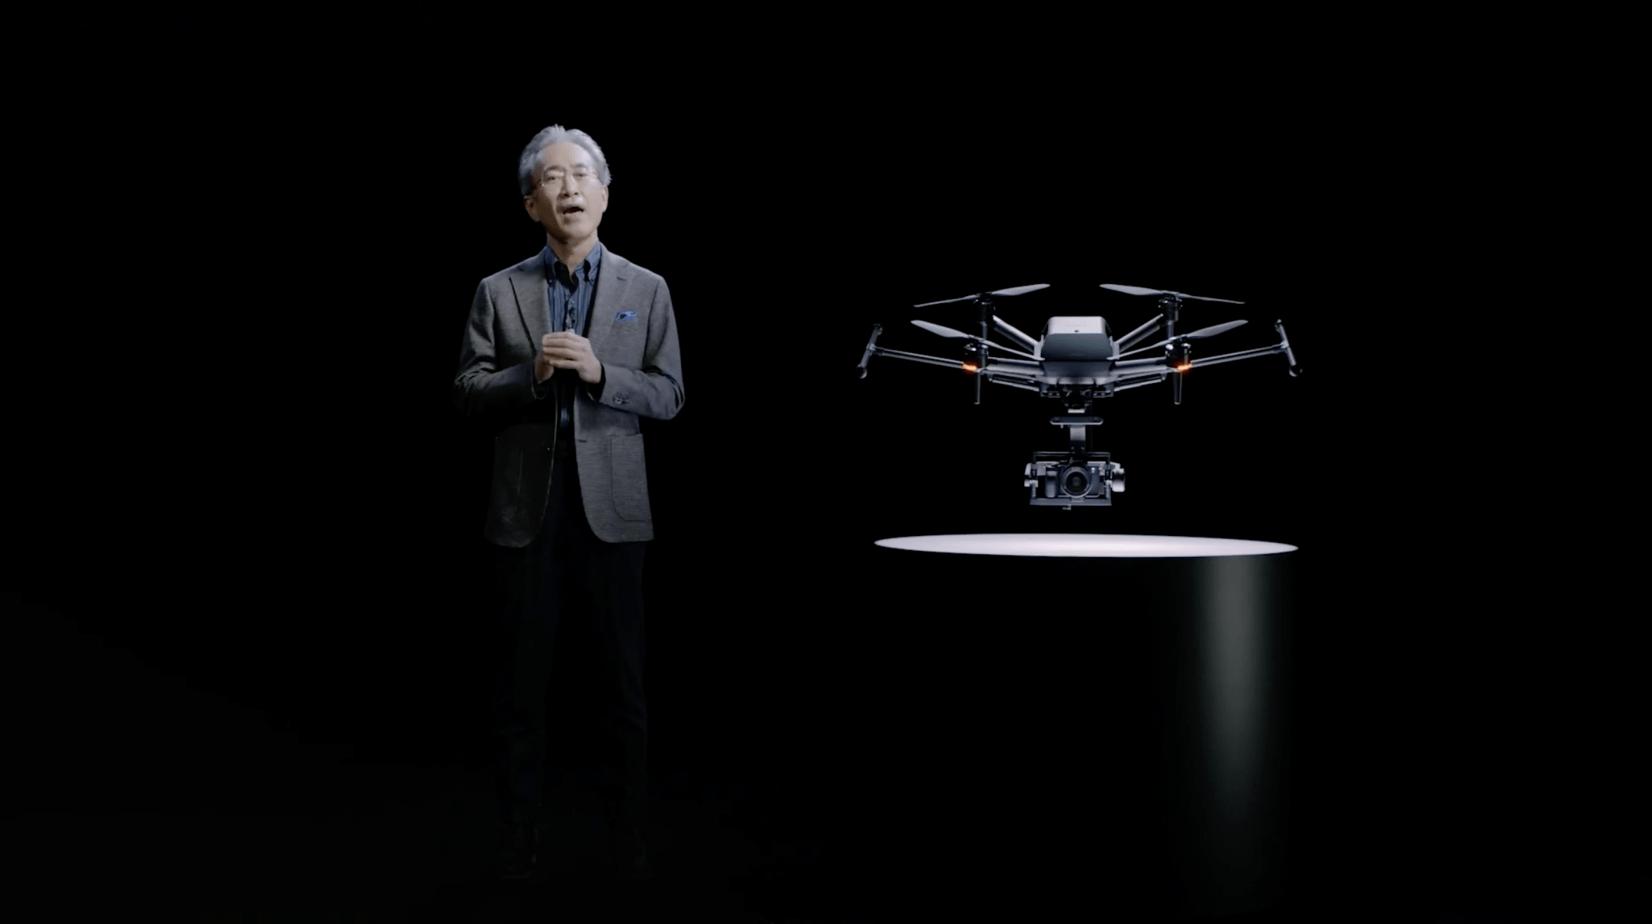 CES21_Sony_Kenichiro Yoshida chmn with AirPeak drone